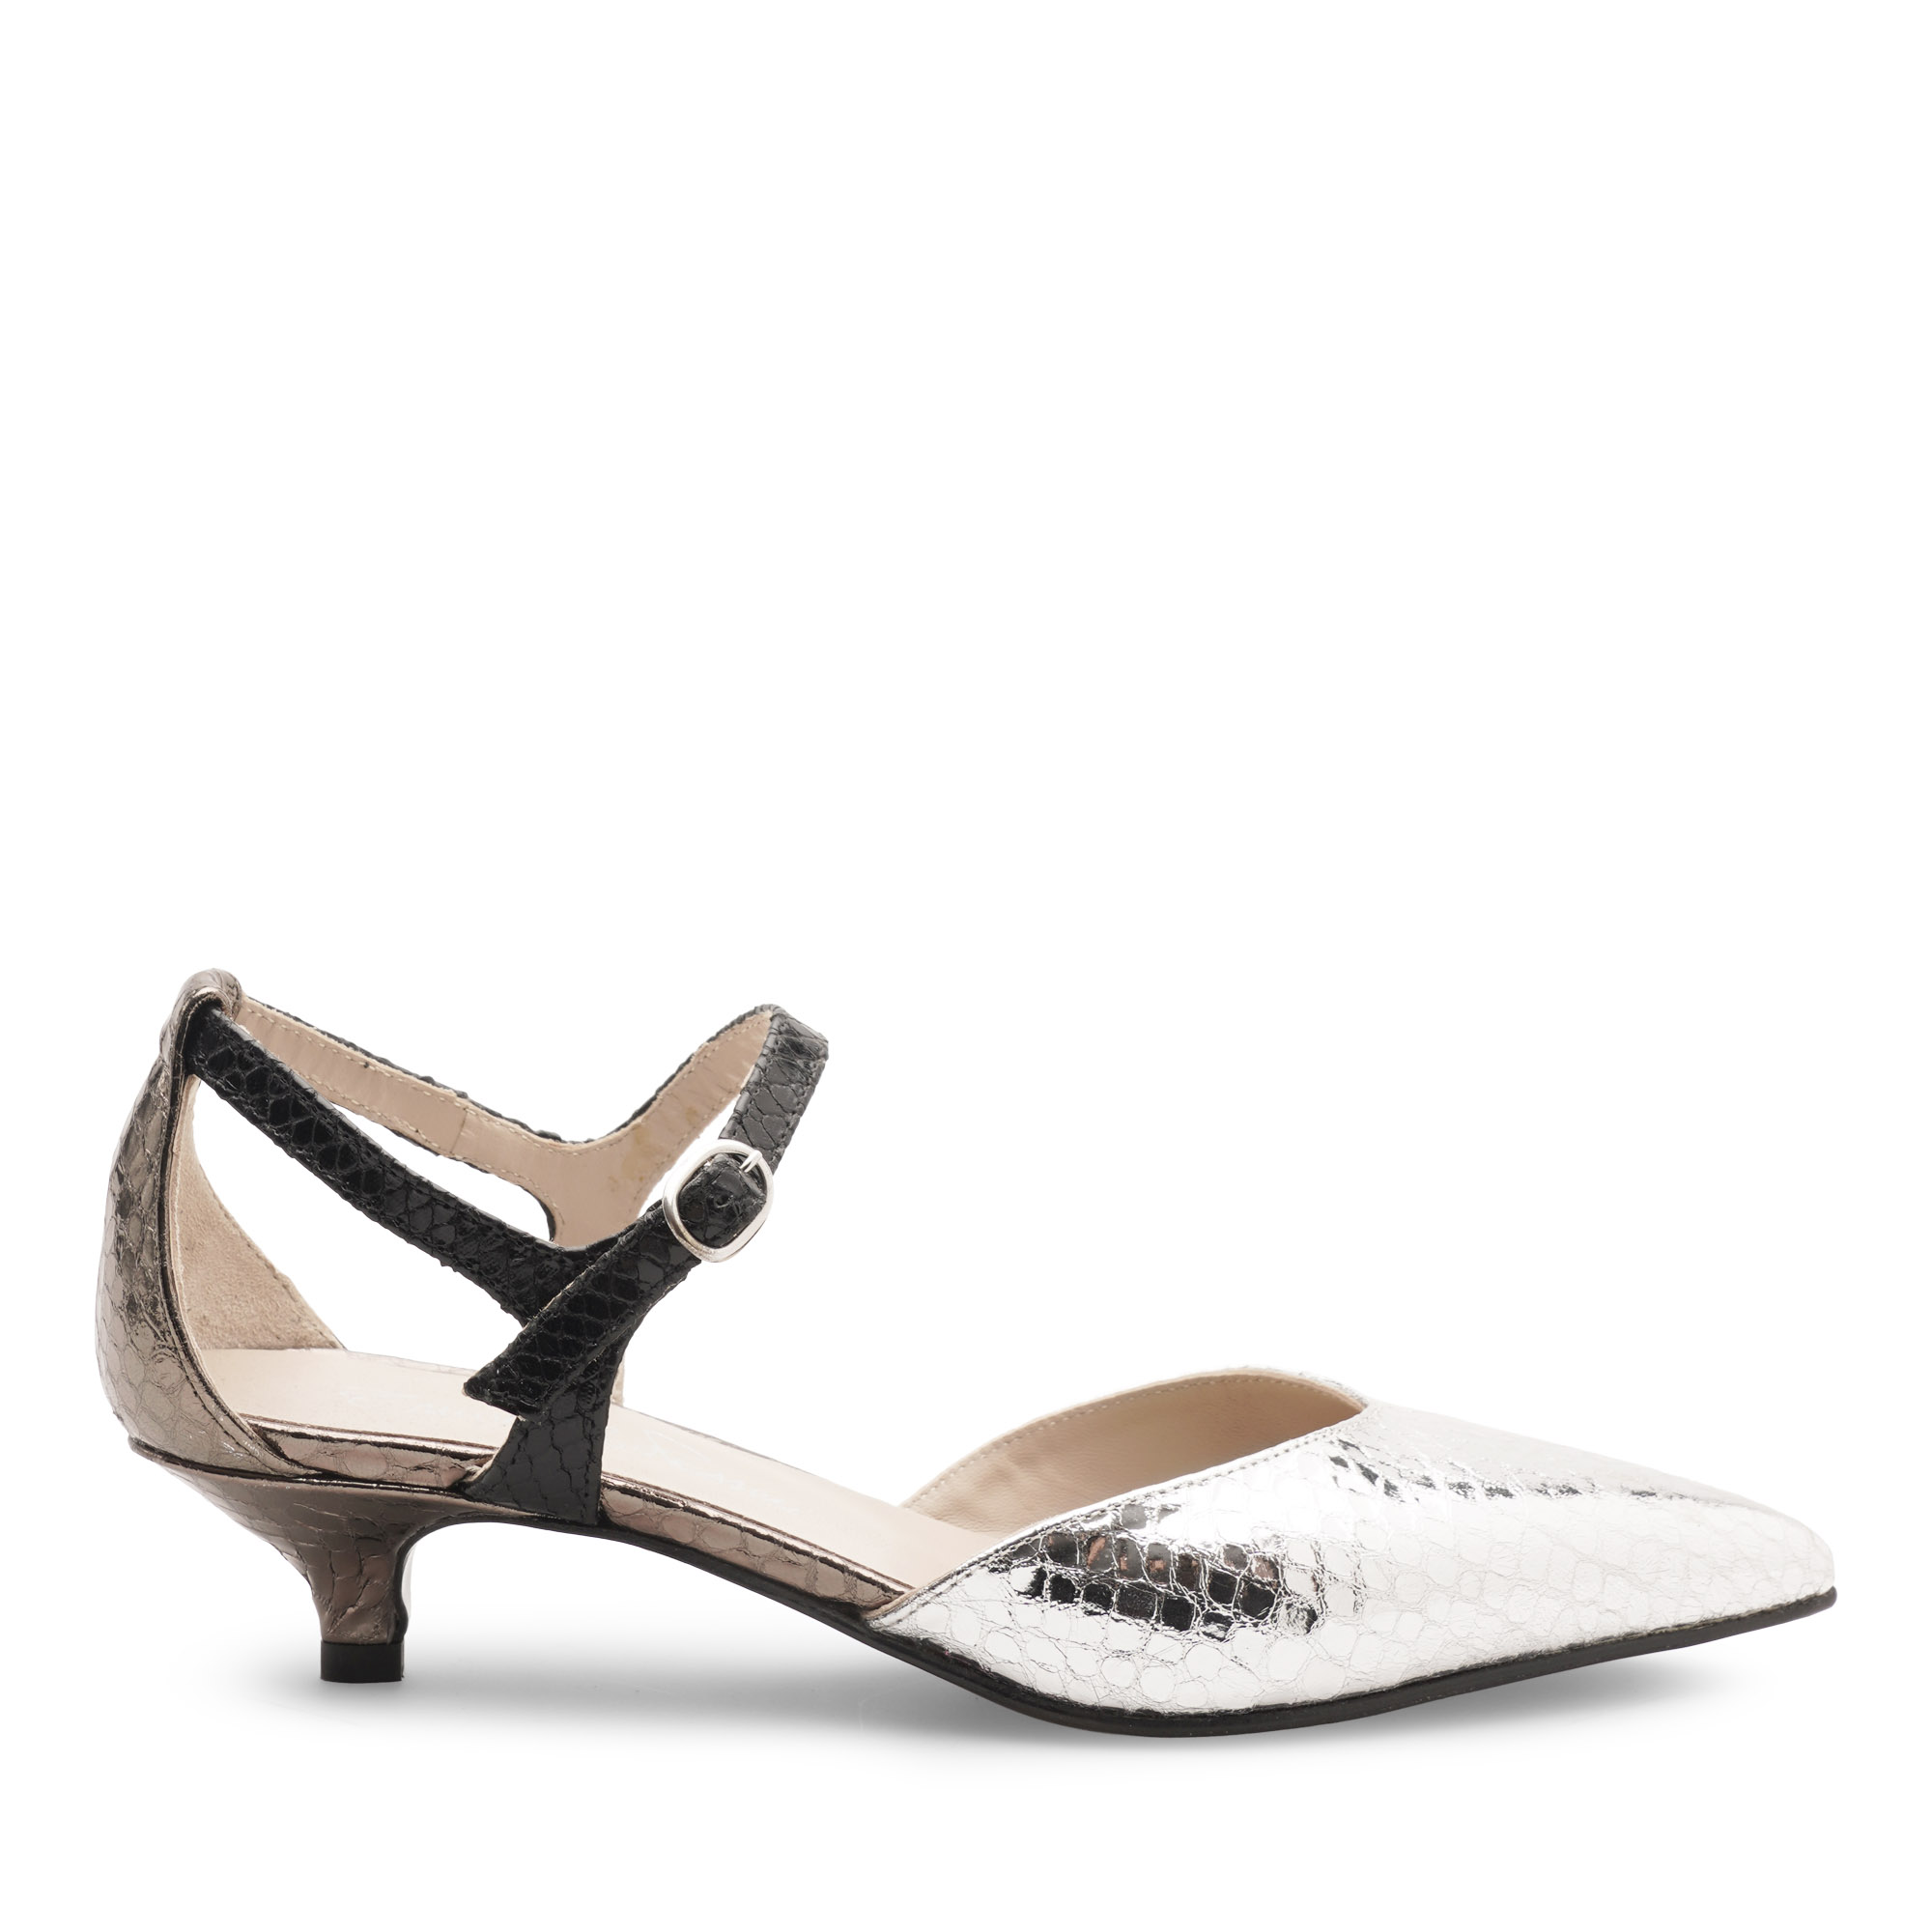 pitone-laminato-argento-emanuela-passeri-shoes-heels-spring-summer-2021